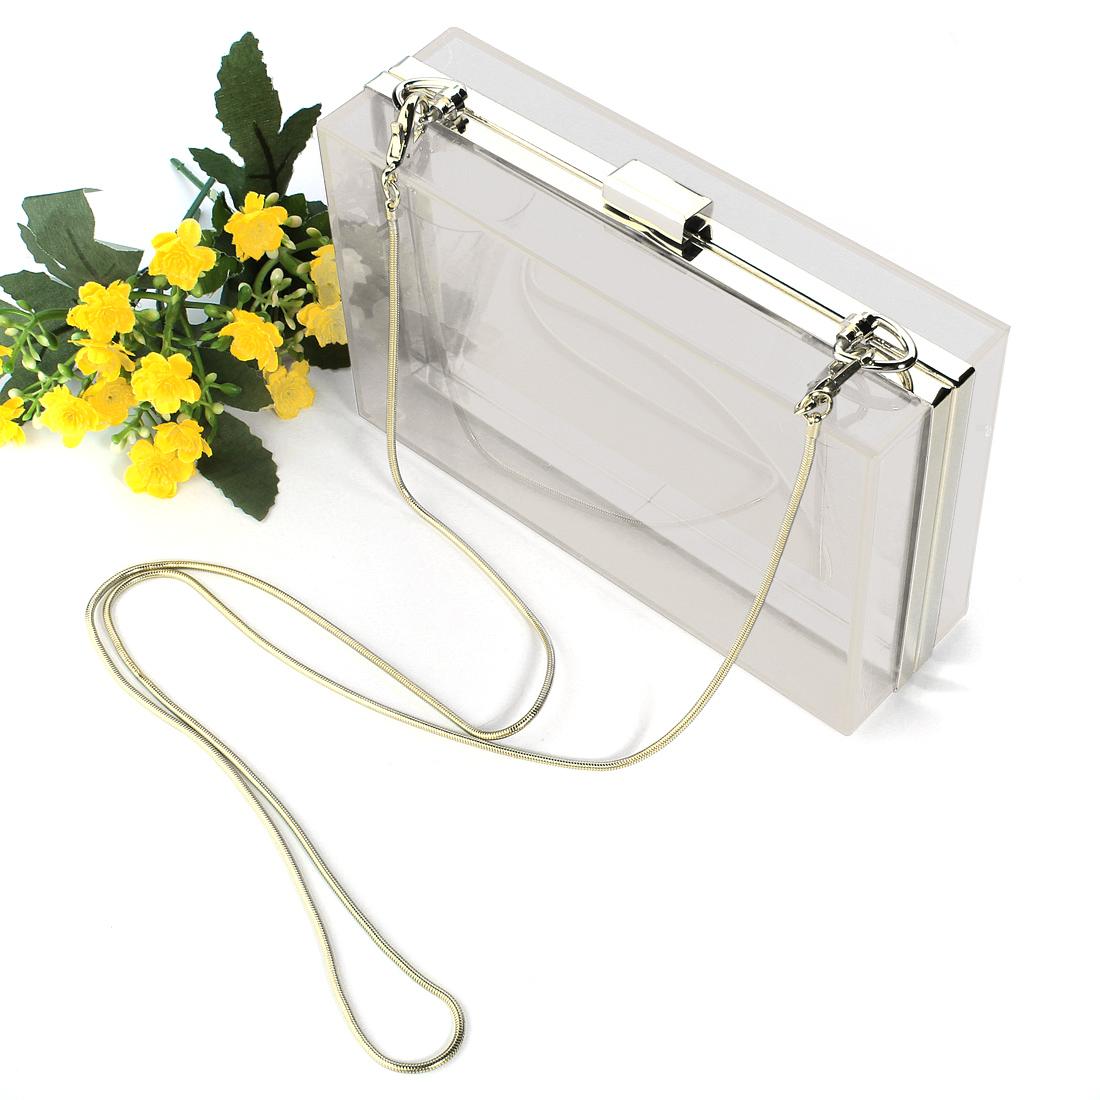 Fashion Women Transparent Acrylic Shoulder Chain Clutch Evening Bag Handbag